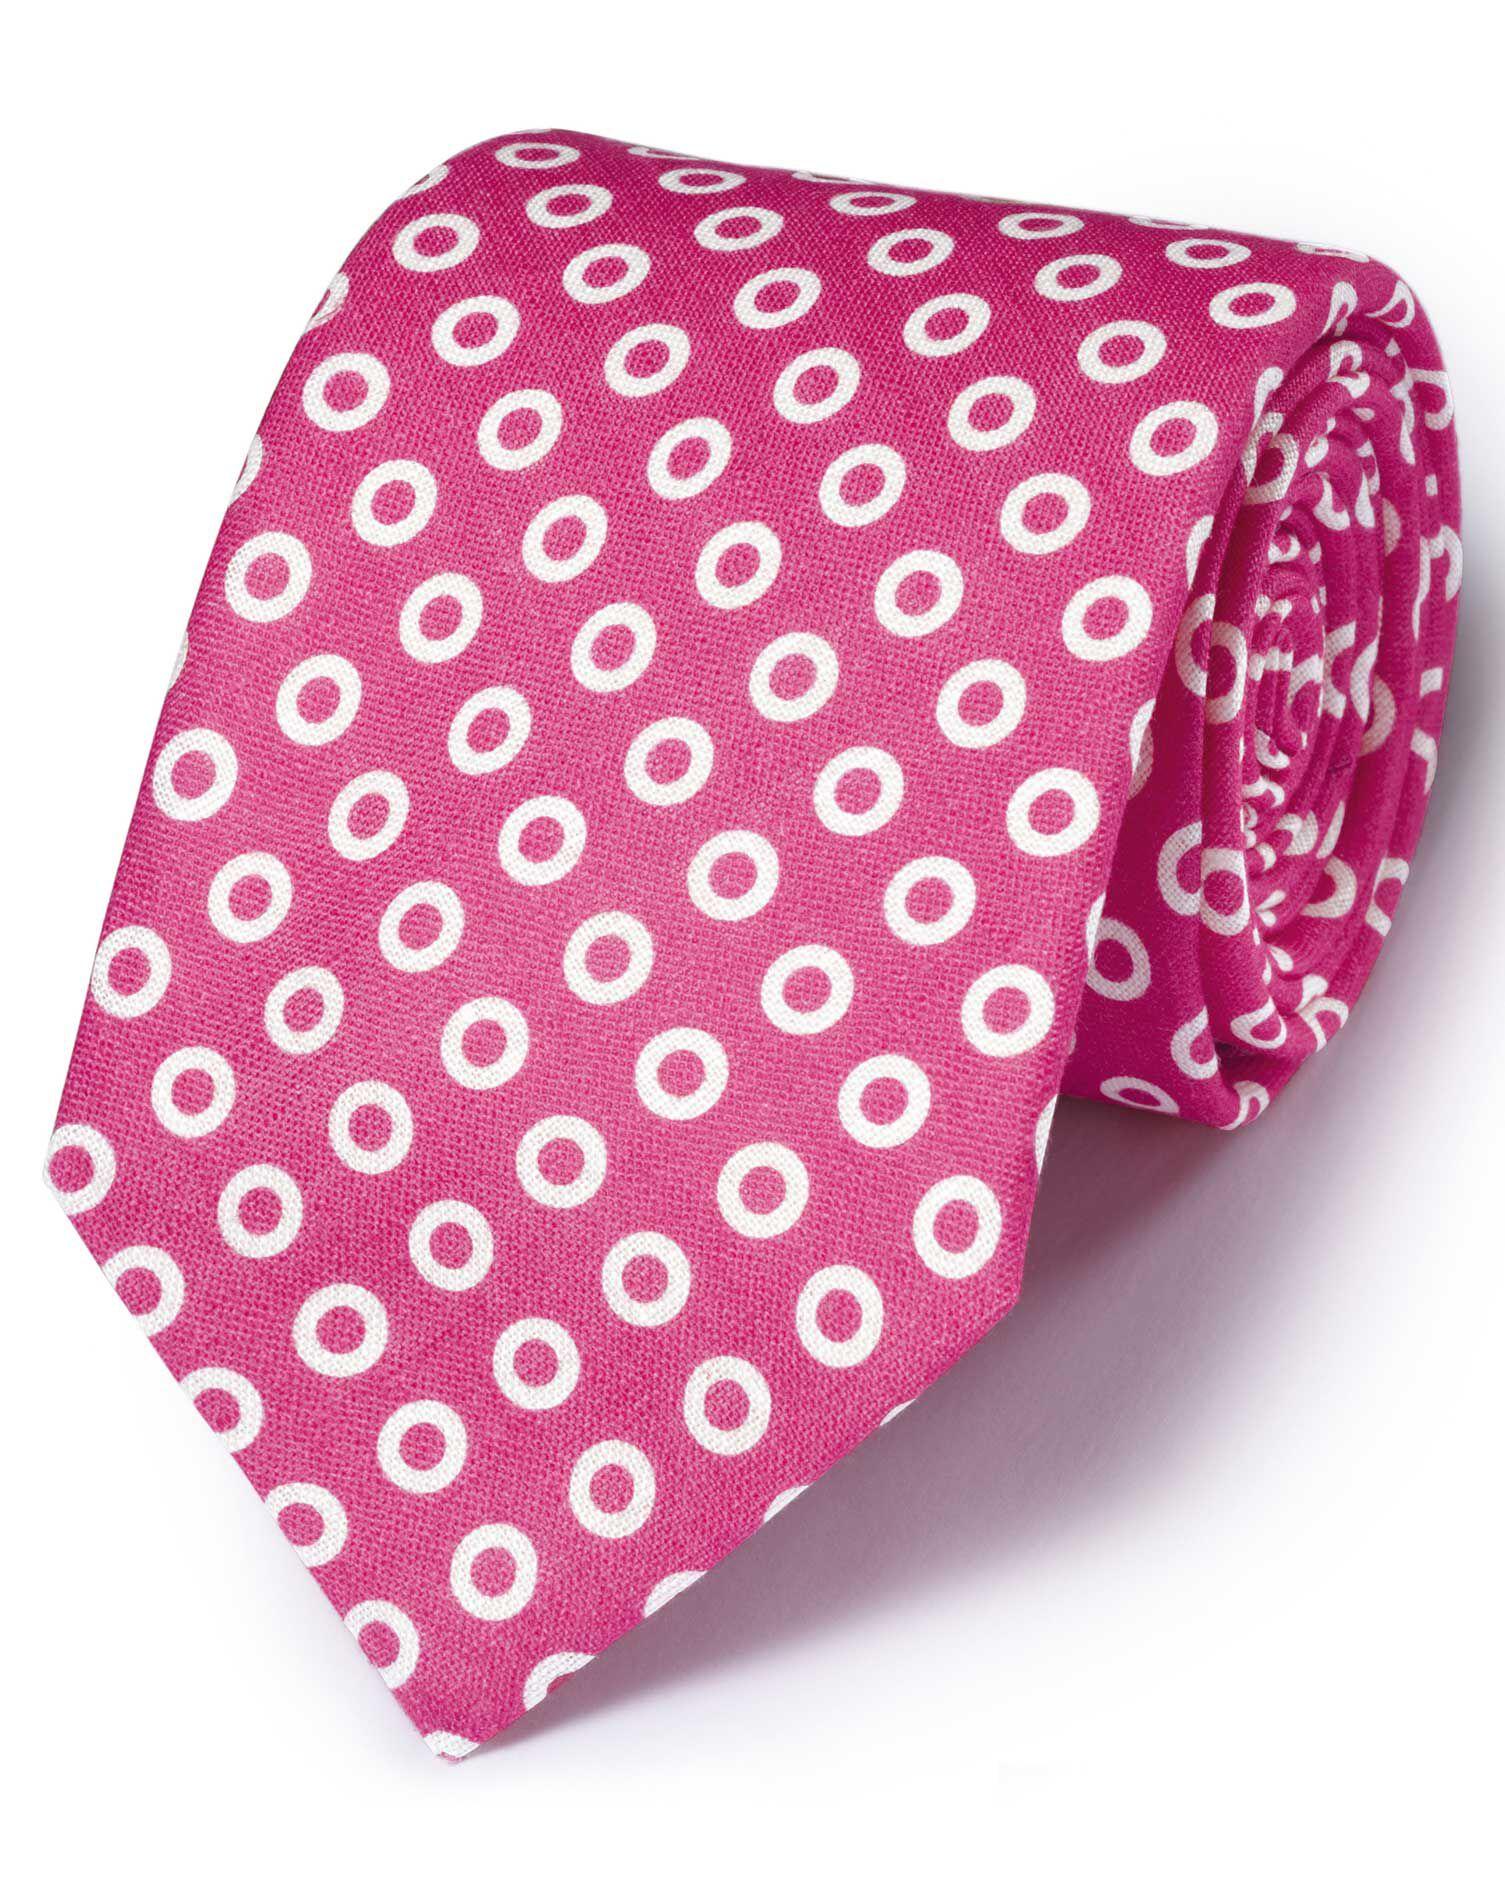 Pink Linen English Luxury Spot Tie Size OSFA by Charles Tyrwhitt